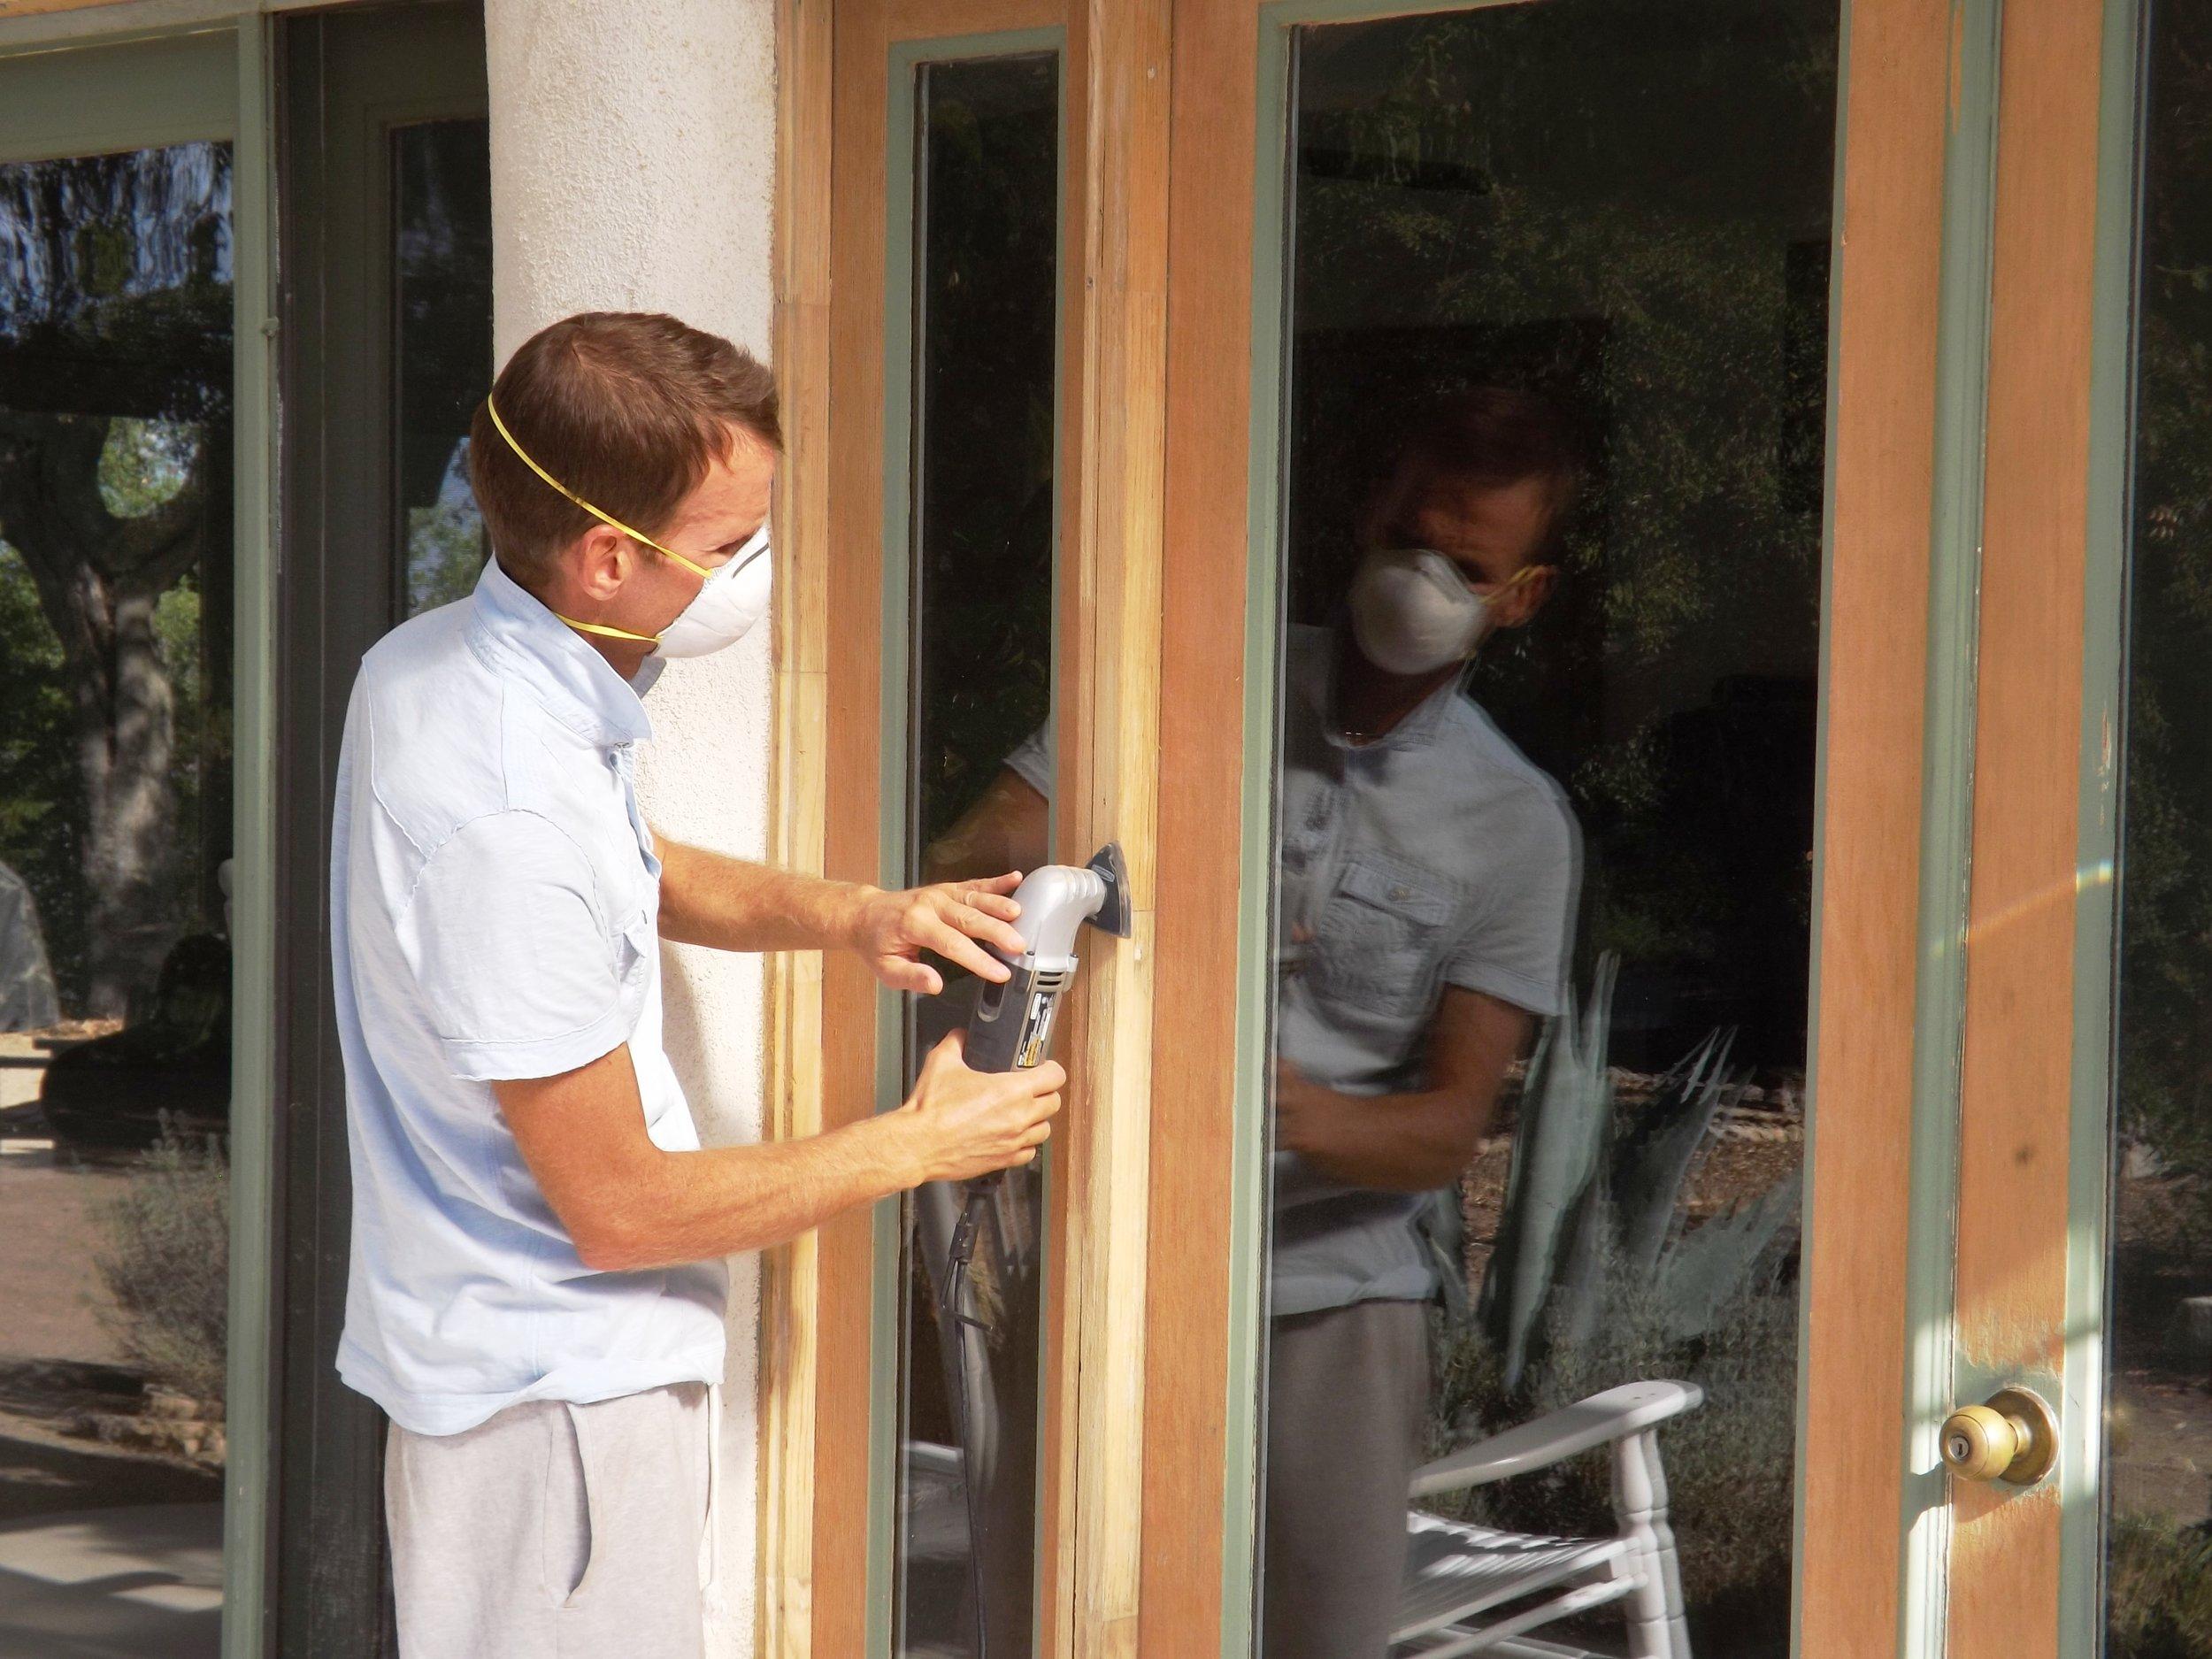 LESLIE BRIDGER sanding the door and window frames in preparation for painting them. (Photo: Rebecca Bridger, 2012)